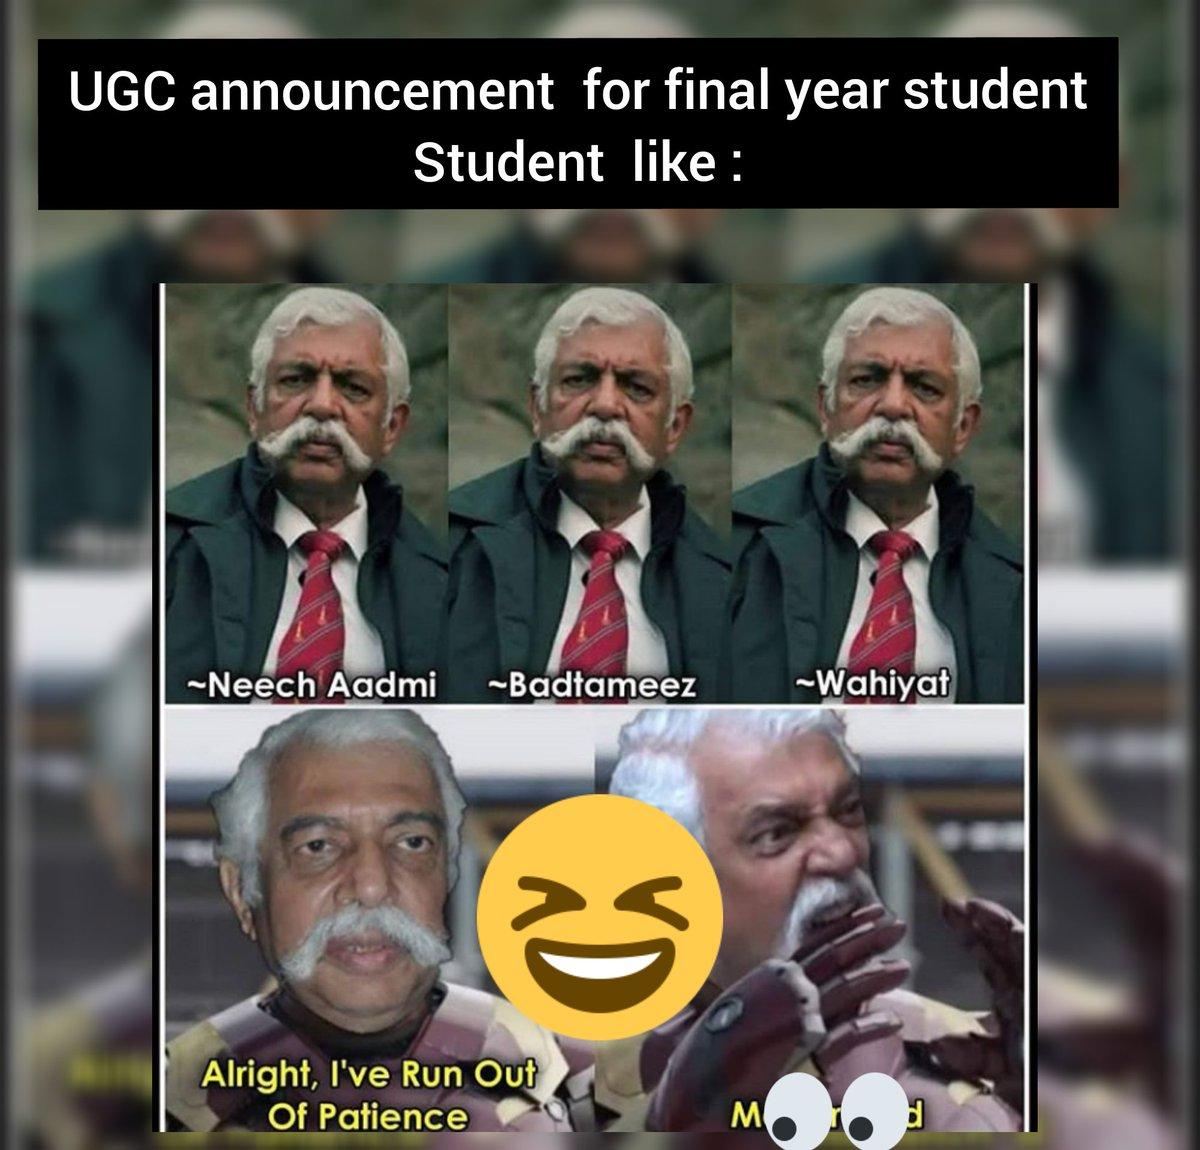 ना डरे ना GYM करे Full भारी गाड़ी में भी और भरे। #COVID19India  #LucknowUniversity  #ugc_cancel_exam  #StudentsLivesMatterspic.twitter.com/Oq2h90LHLT